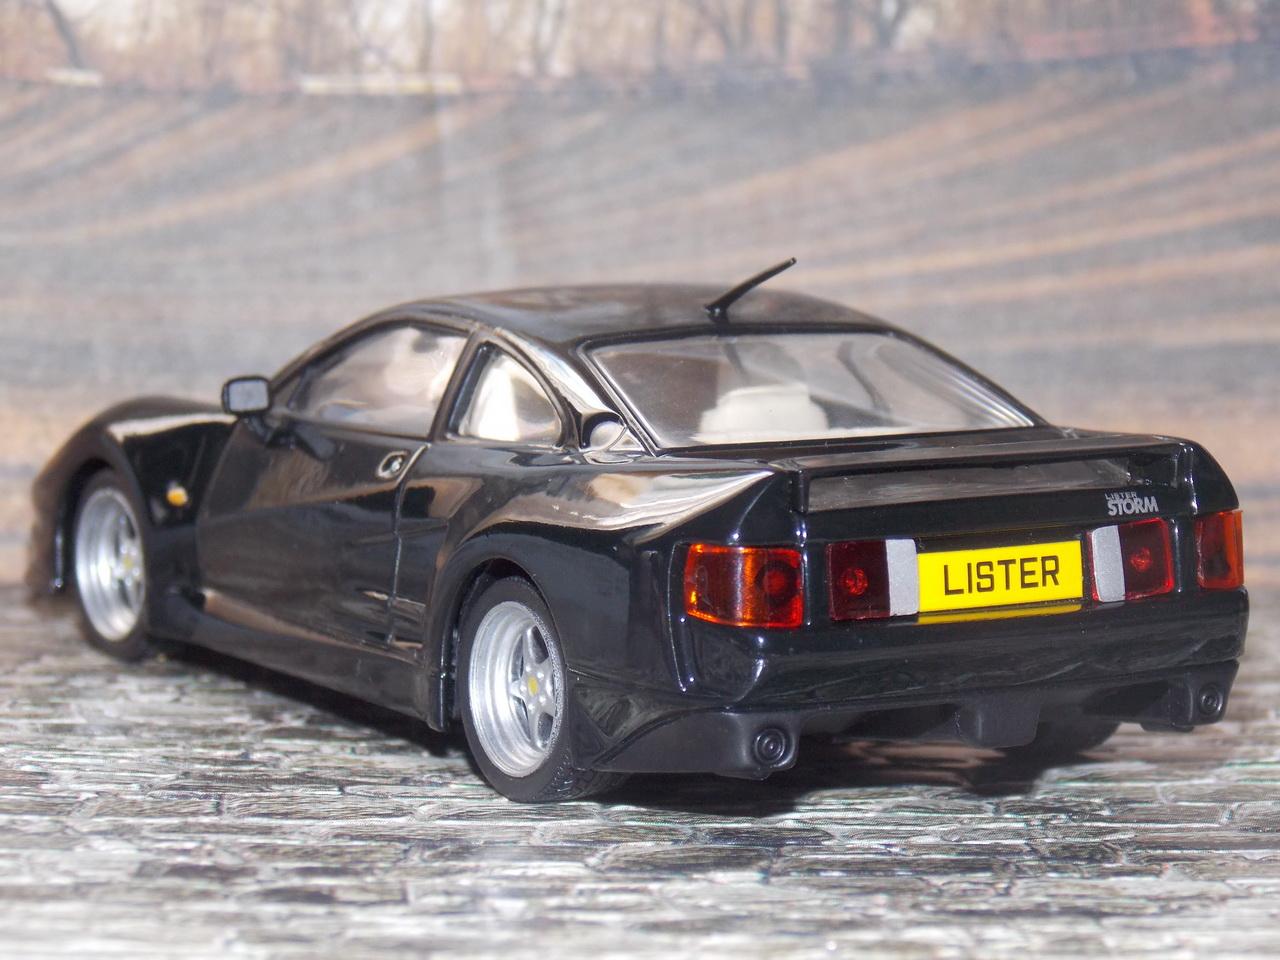 Lister Storm GTL